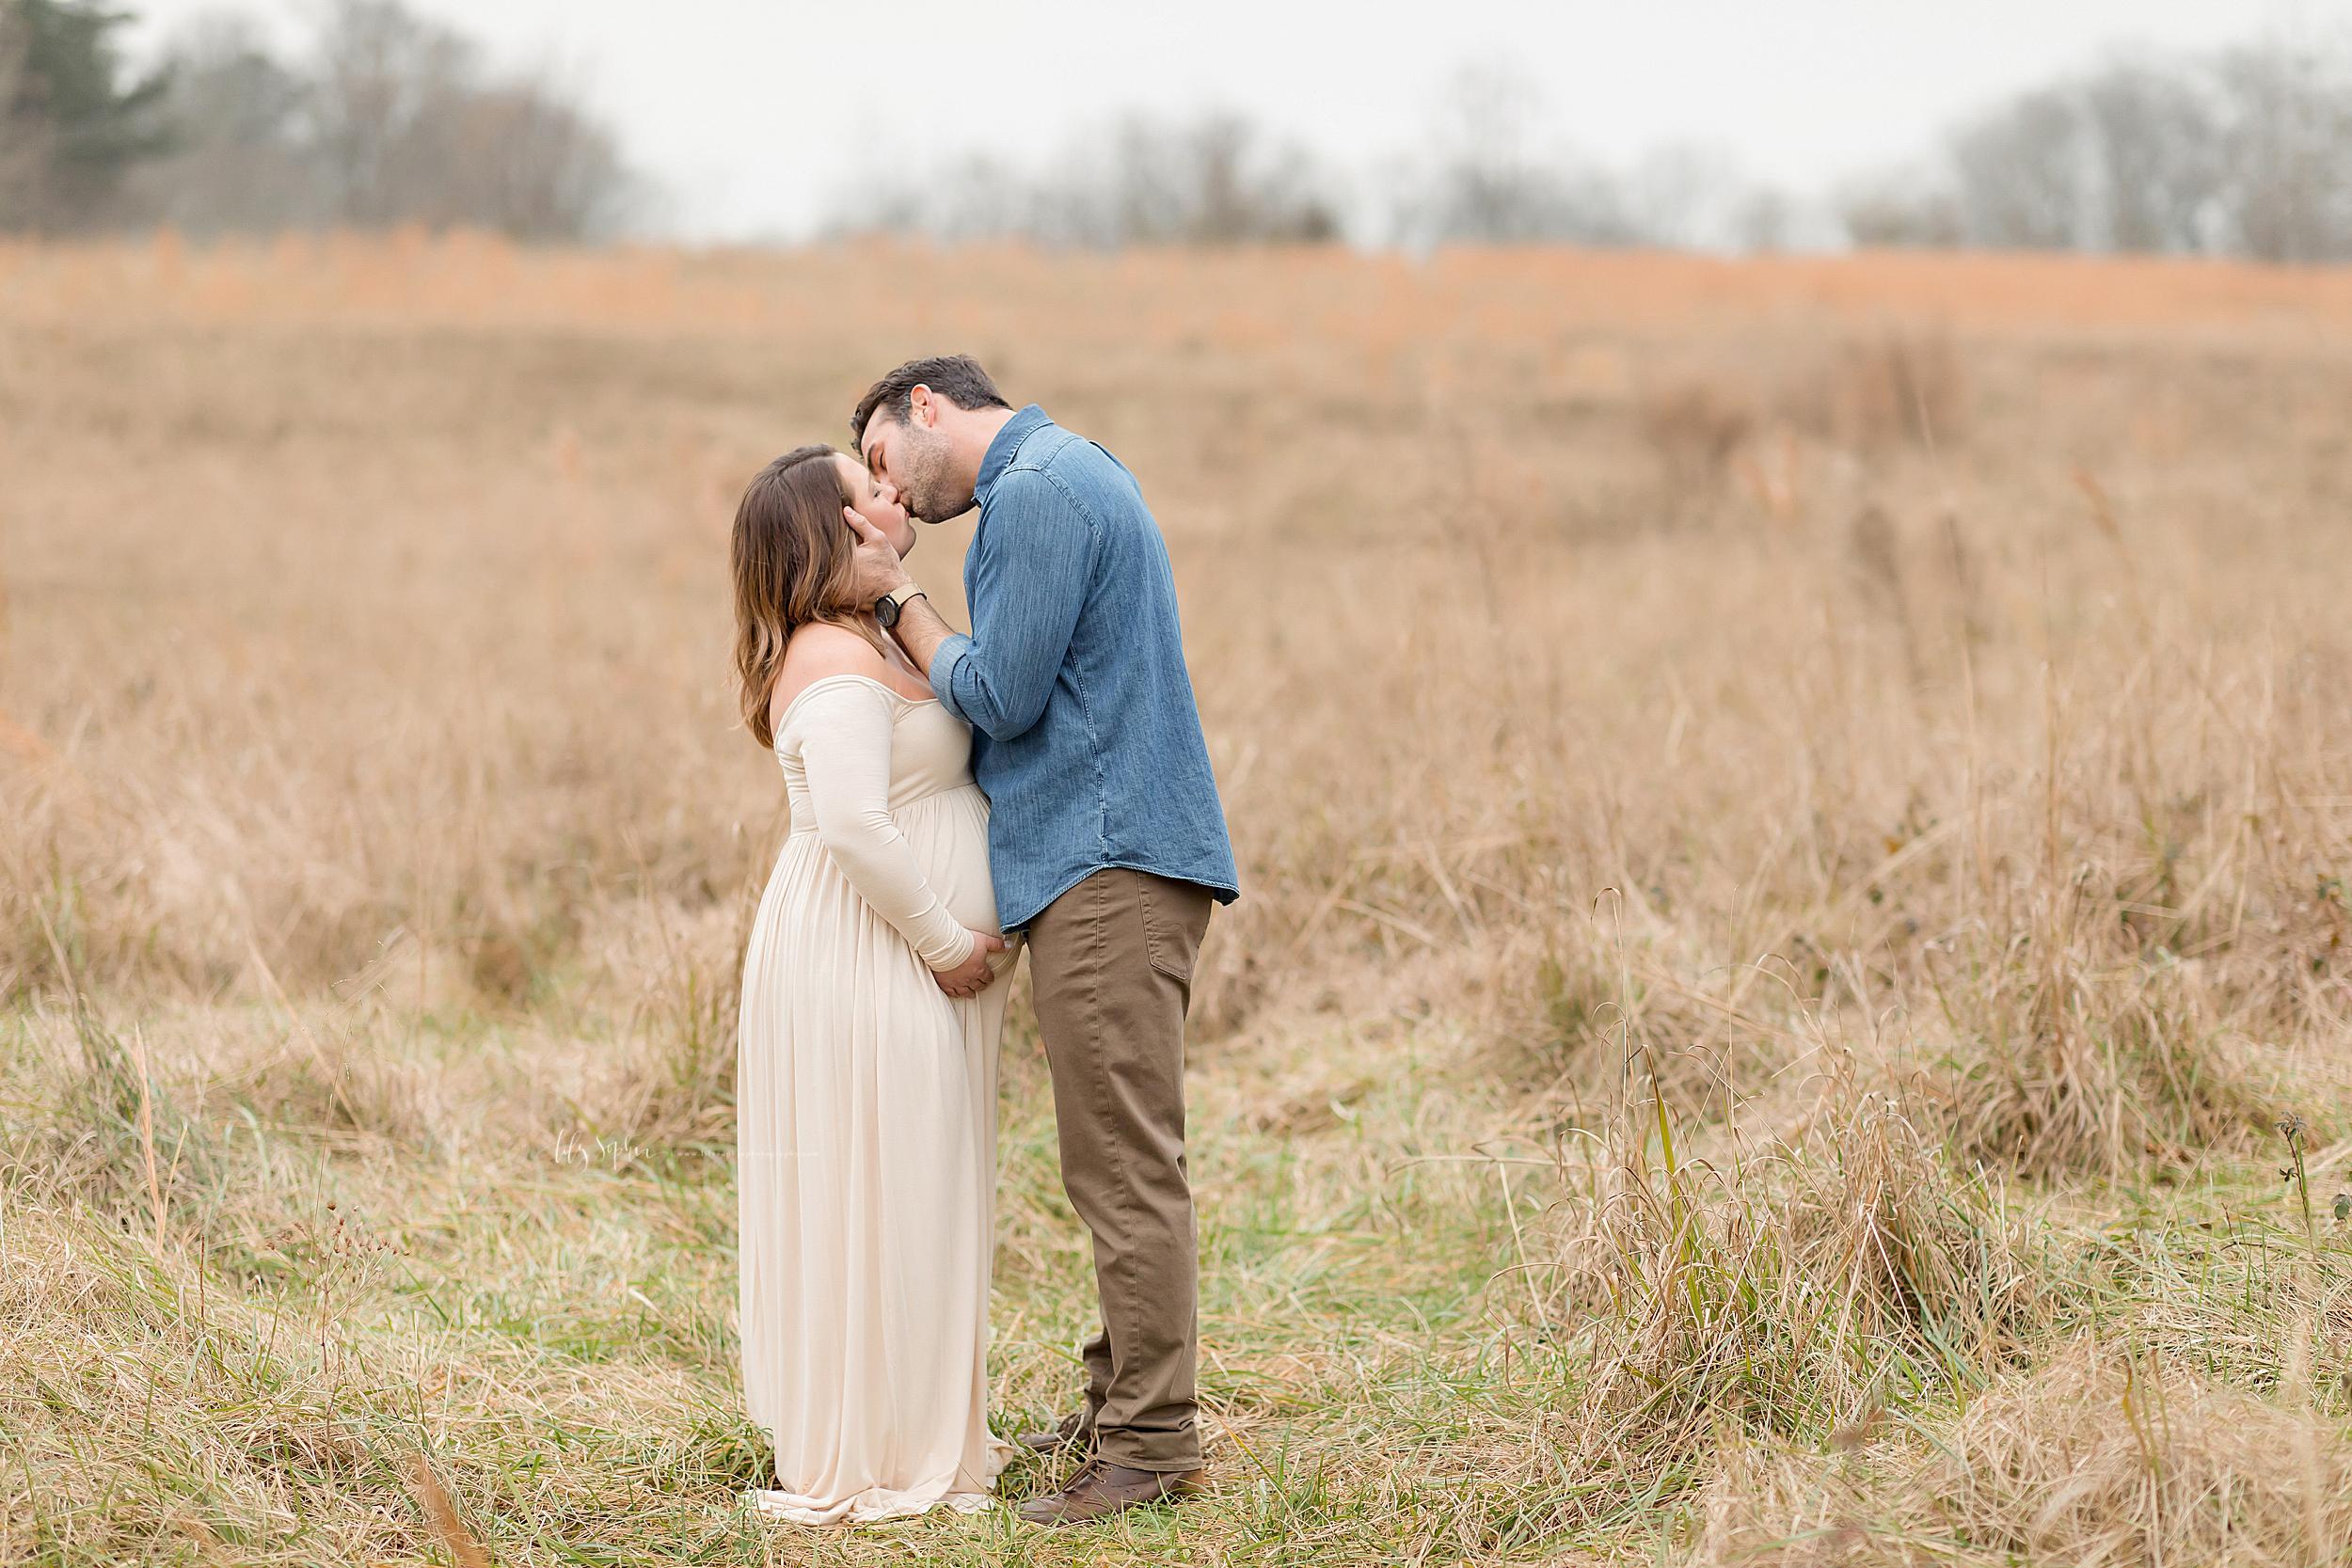 atlanta-cumming-brookhaven-alpharetta-virginia-highlands-roswell-decatur-lily-sophia-photography-outdoor-field-sunset-couples-maternity-photos_0689.jpg